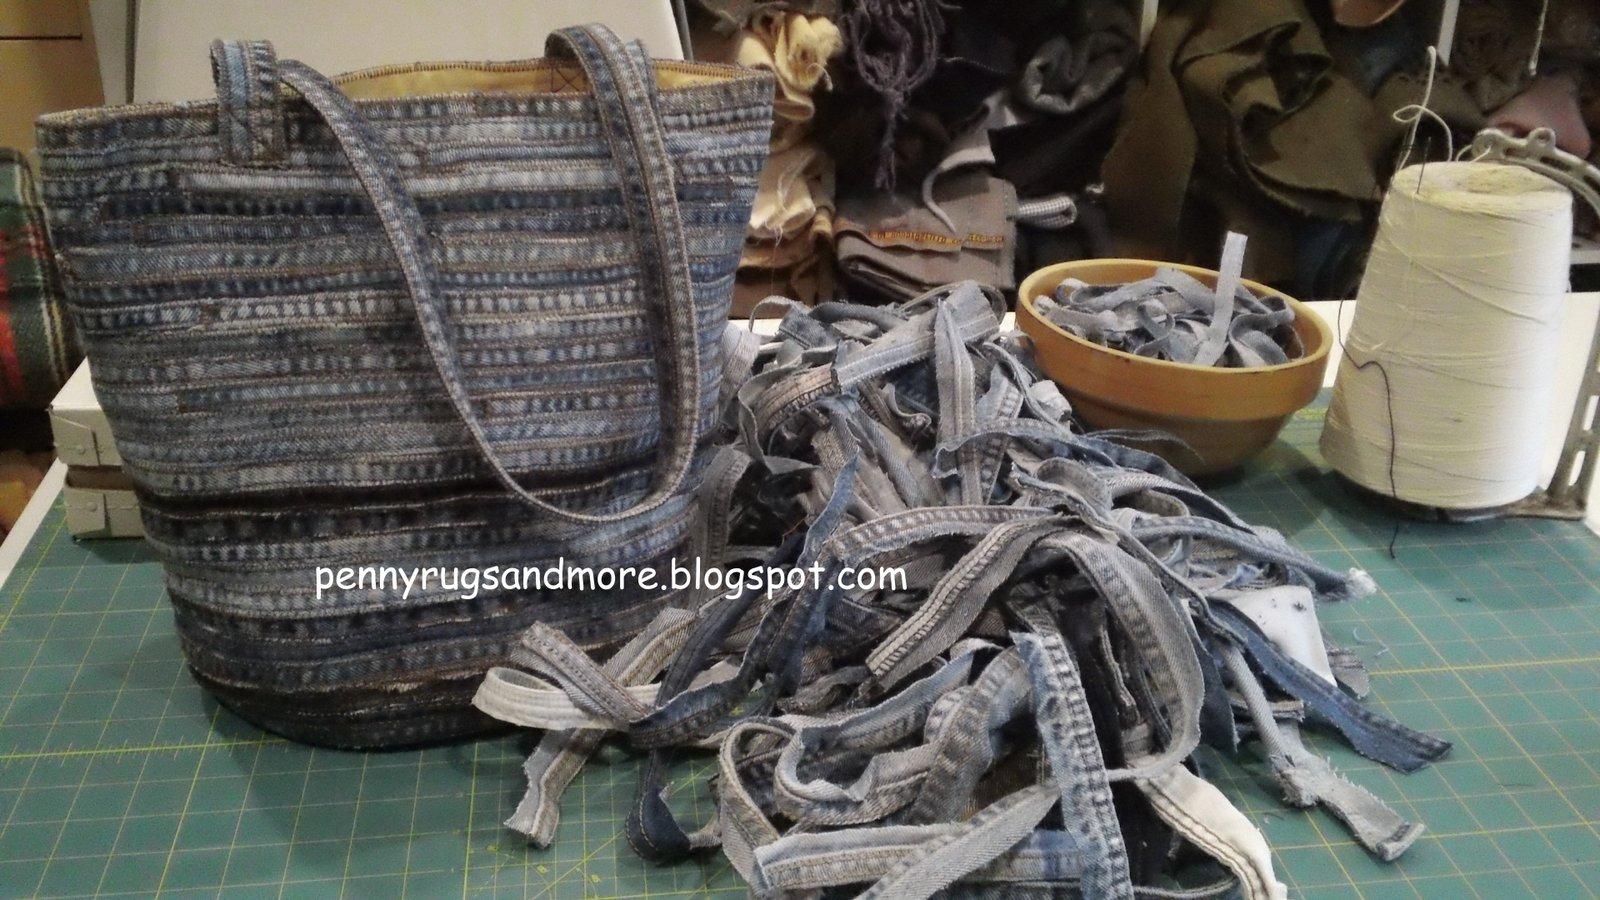 Penny Rugs and More Flat Felled Seam Denim Bag Tutorial